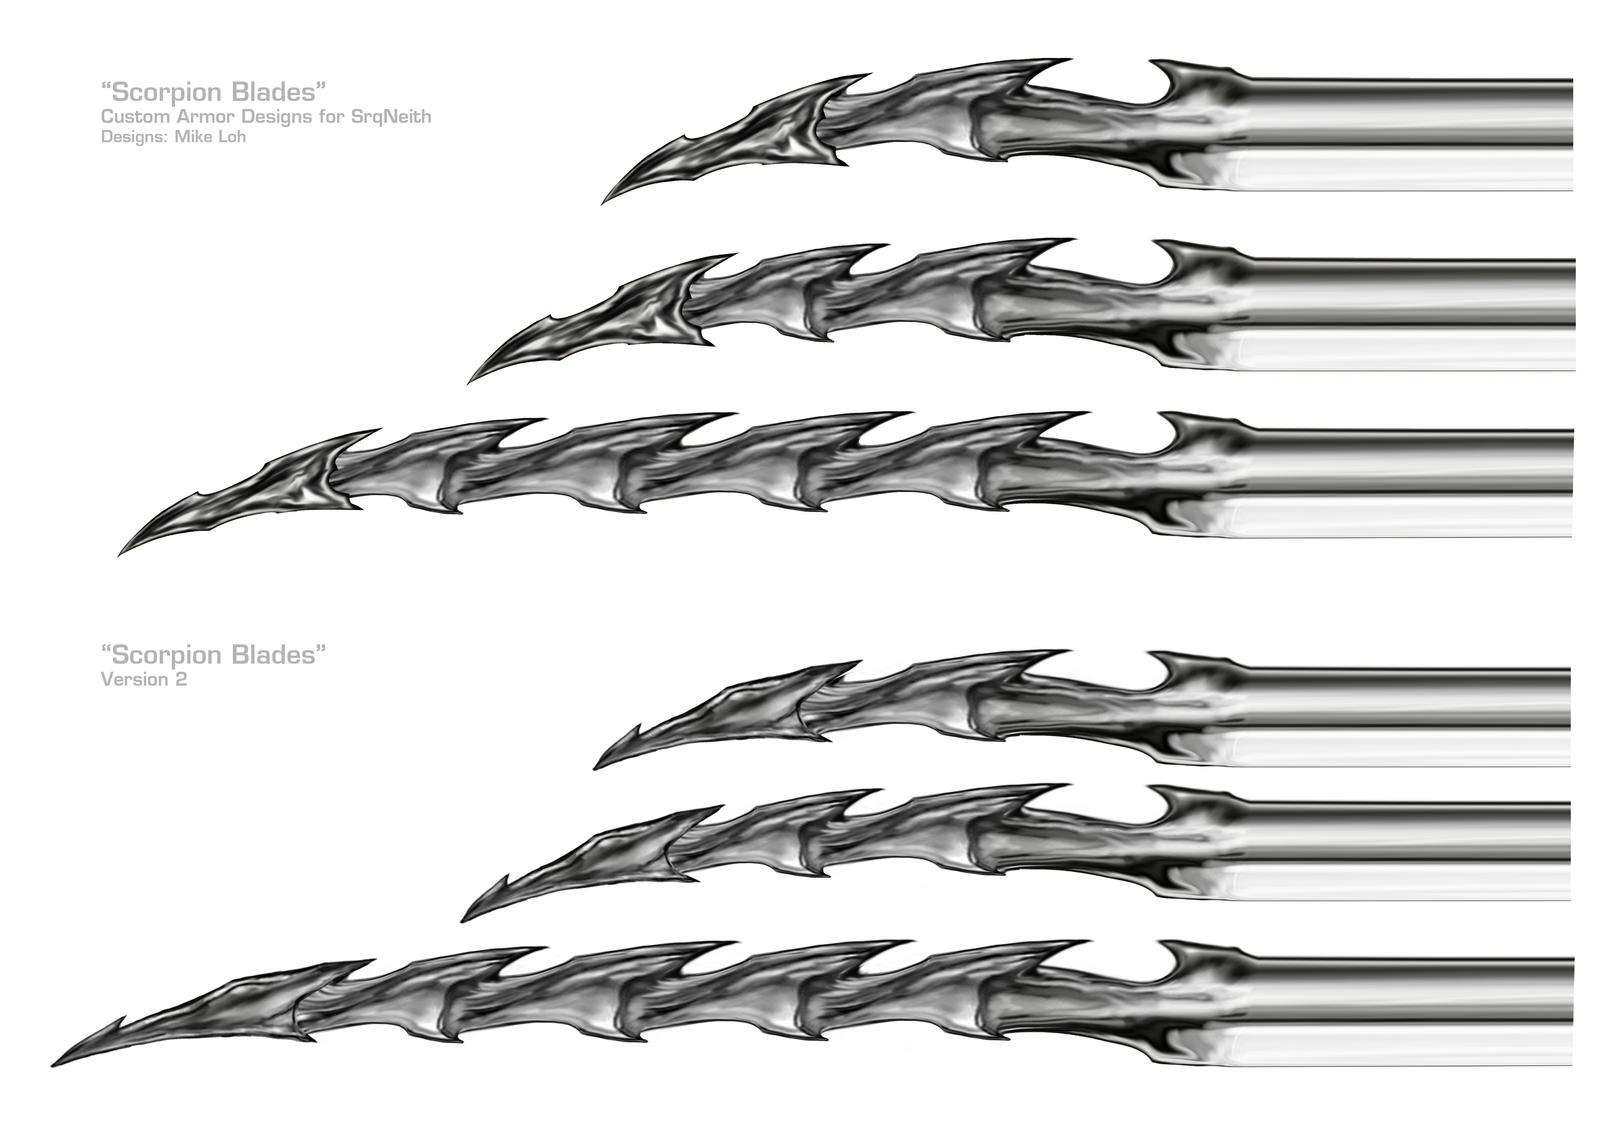 Scorpion blades by uratz studios on deviantart - Uratz studios ...